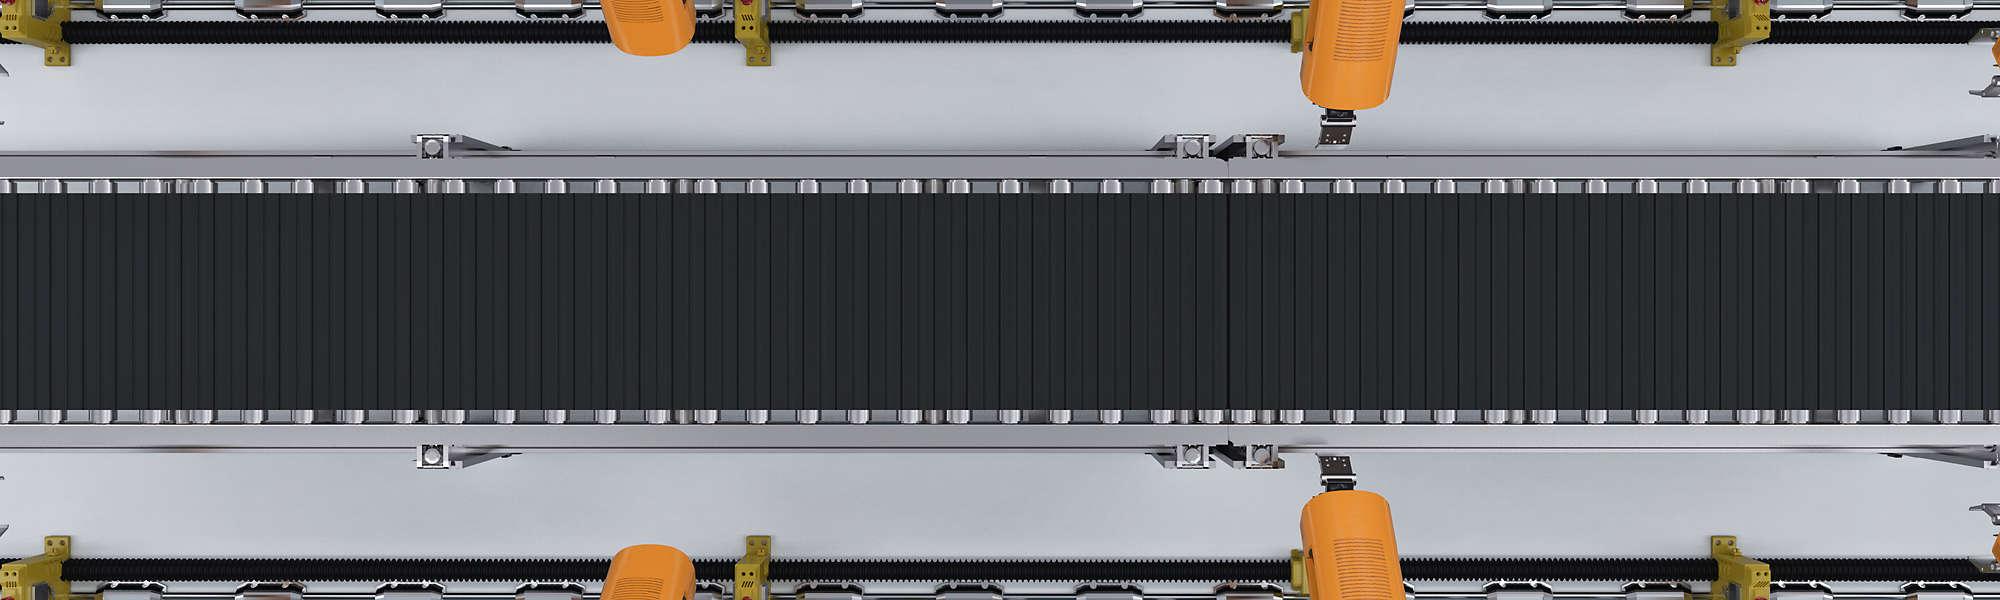 Robotic machine conveyor factory